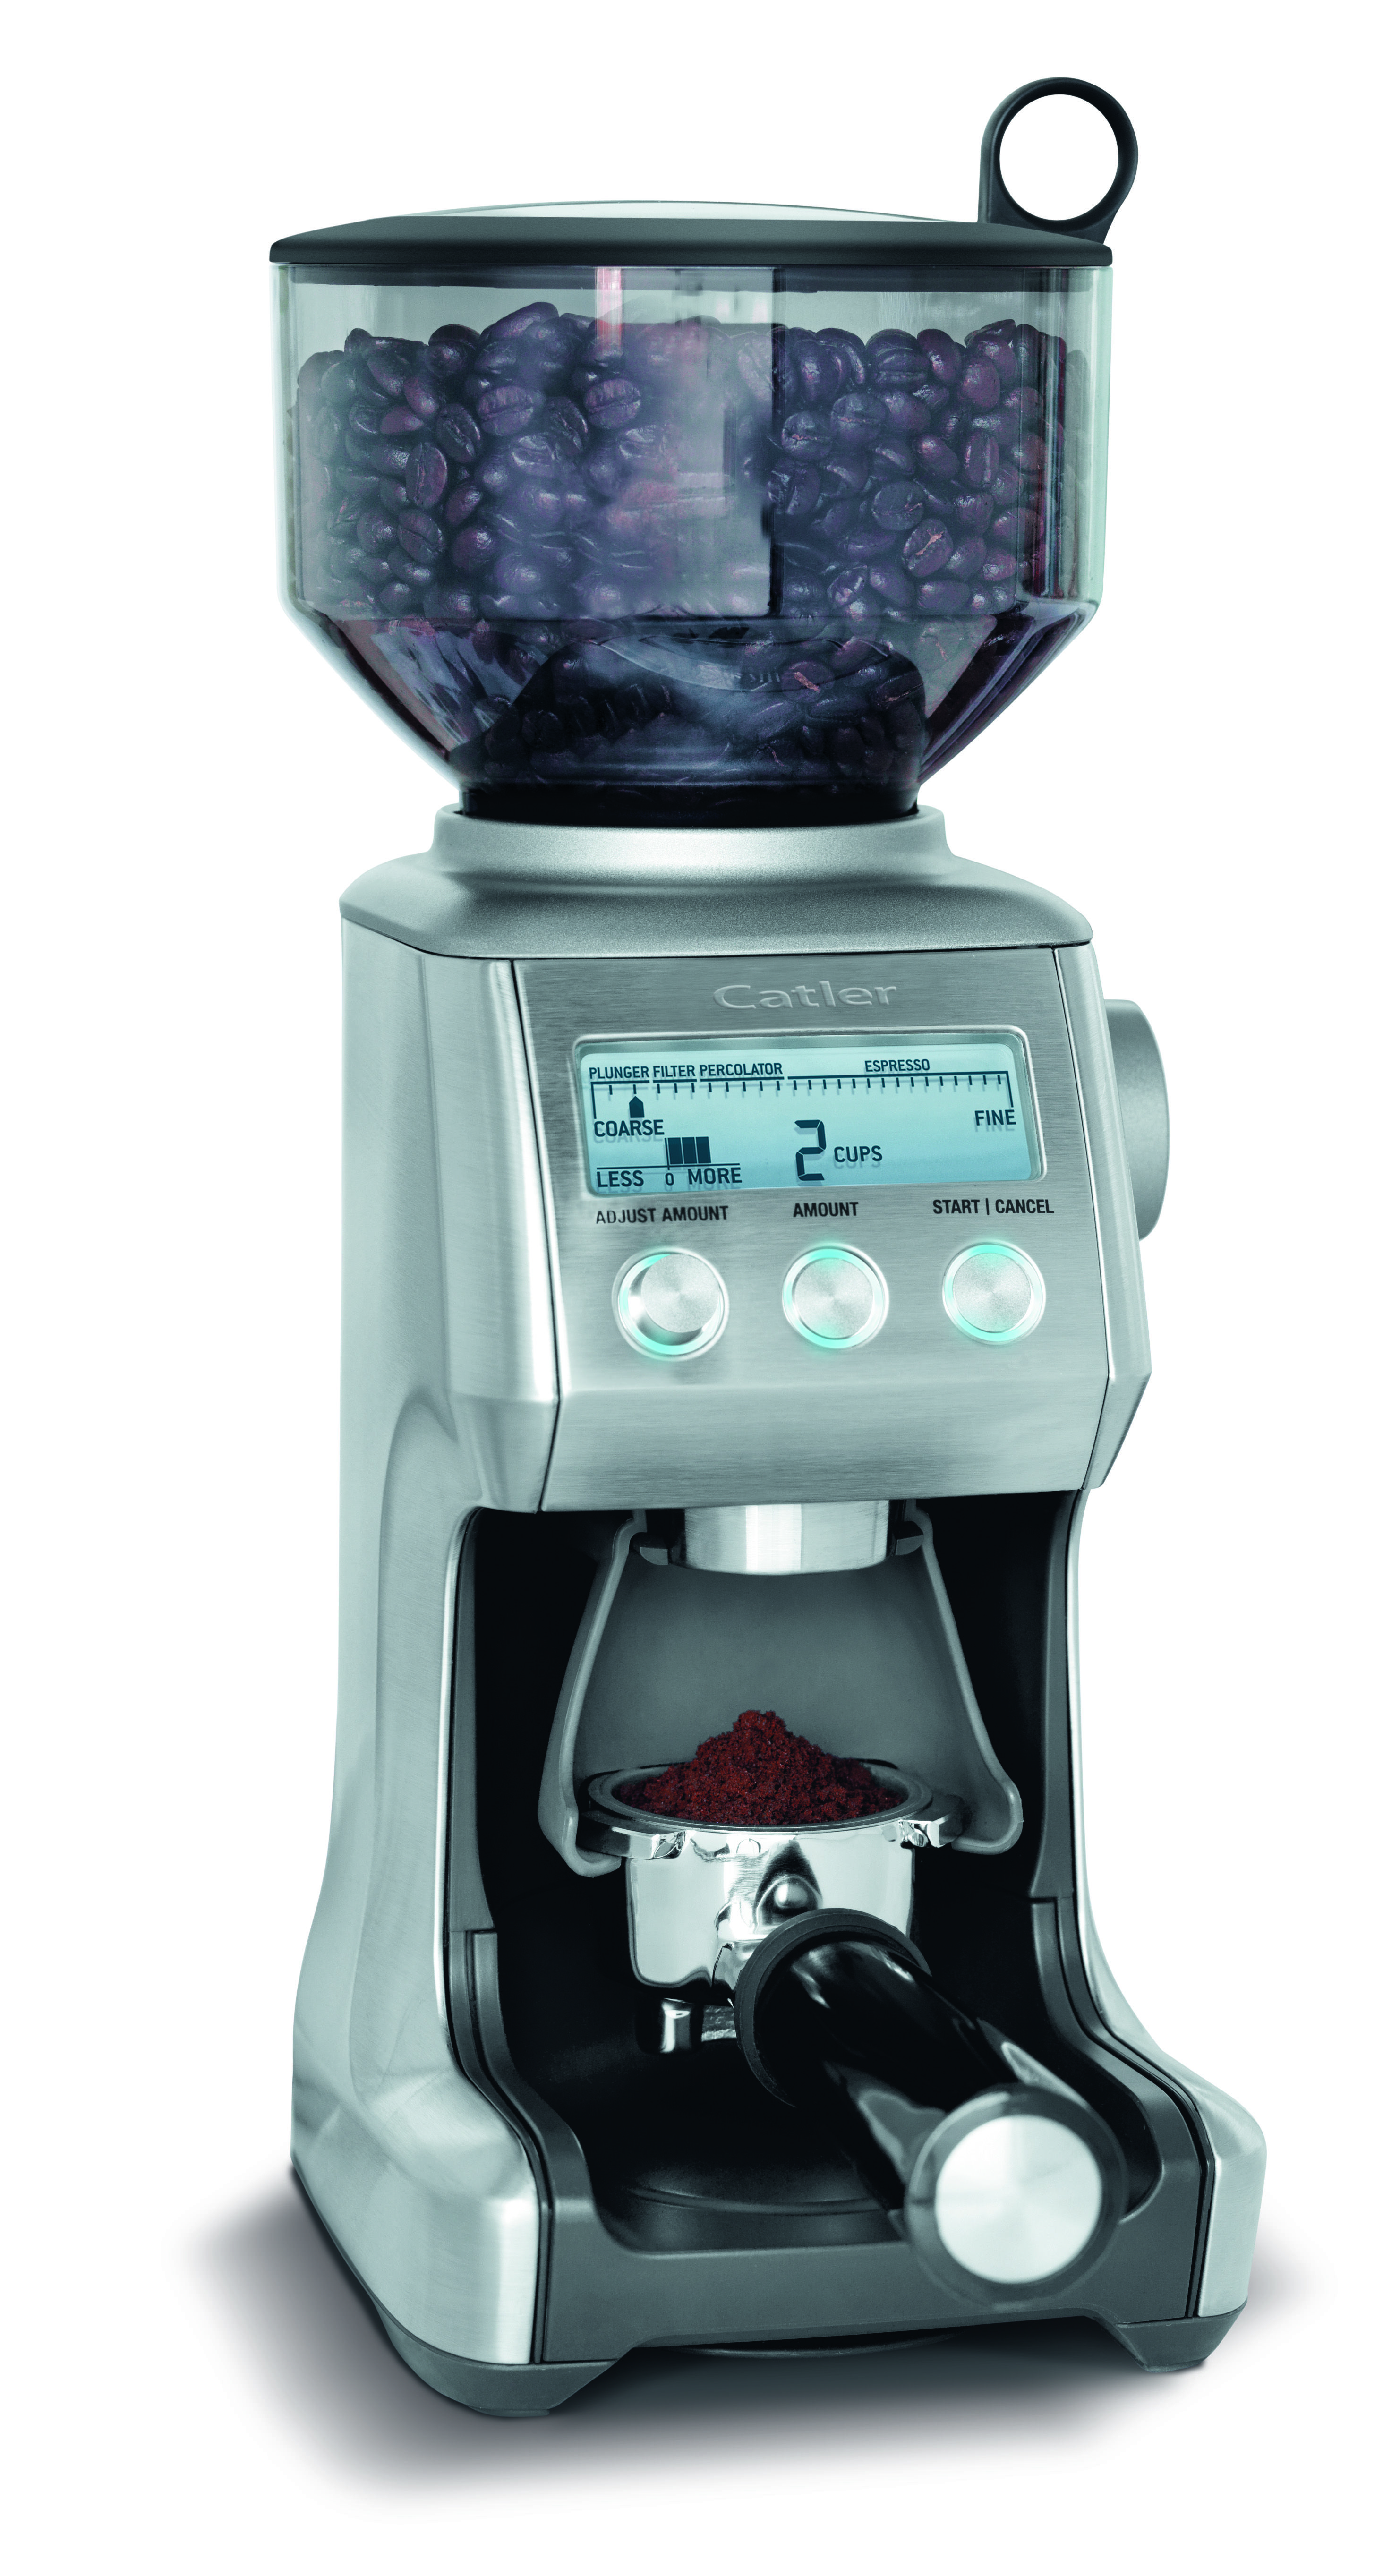 Automatic coffee grinder catler cg 8010 espresso